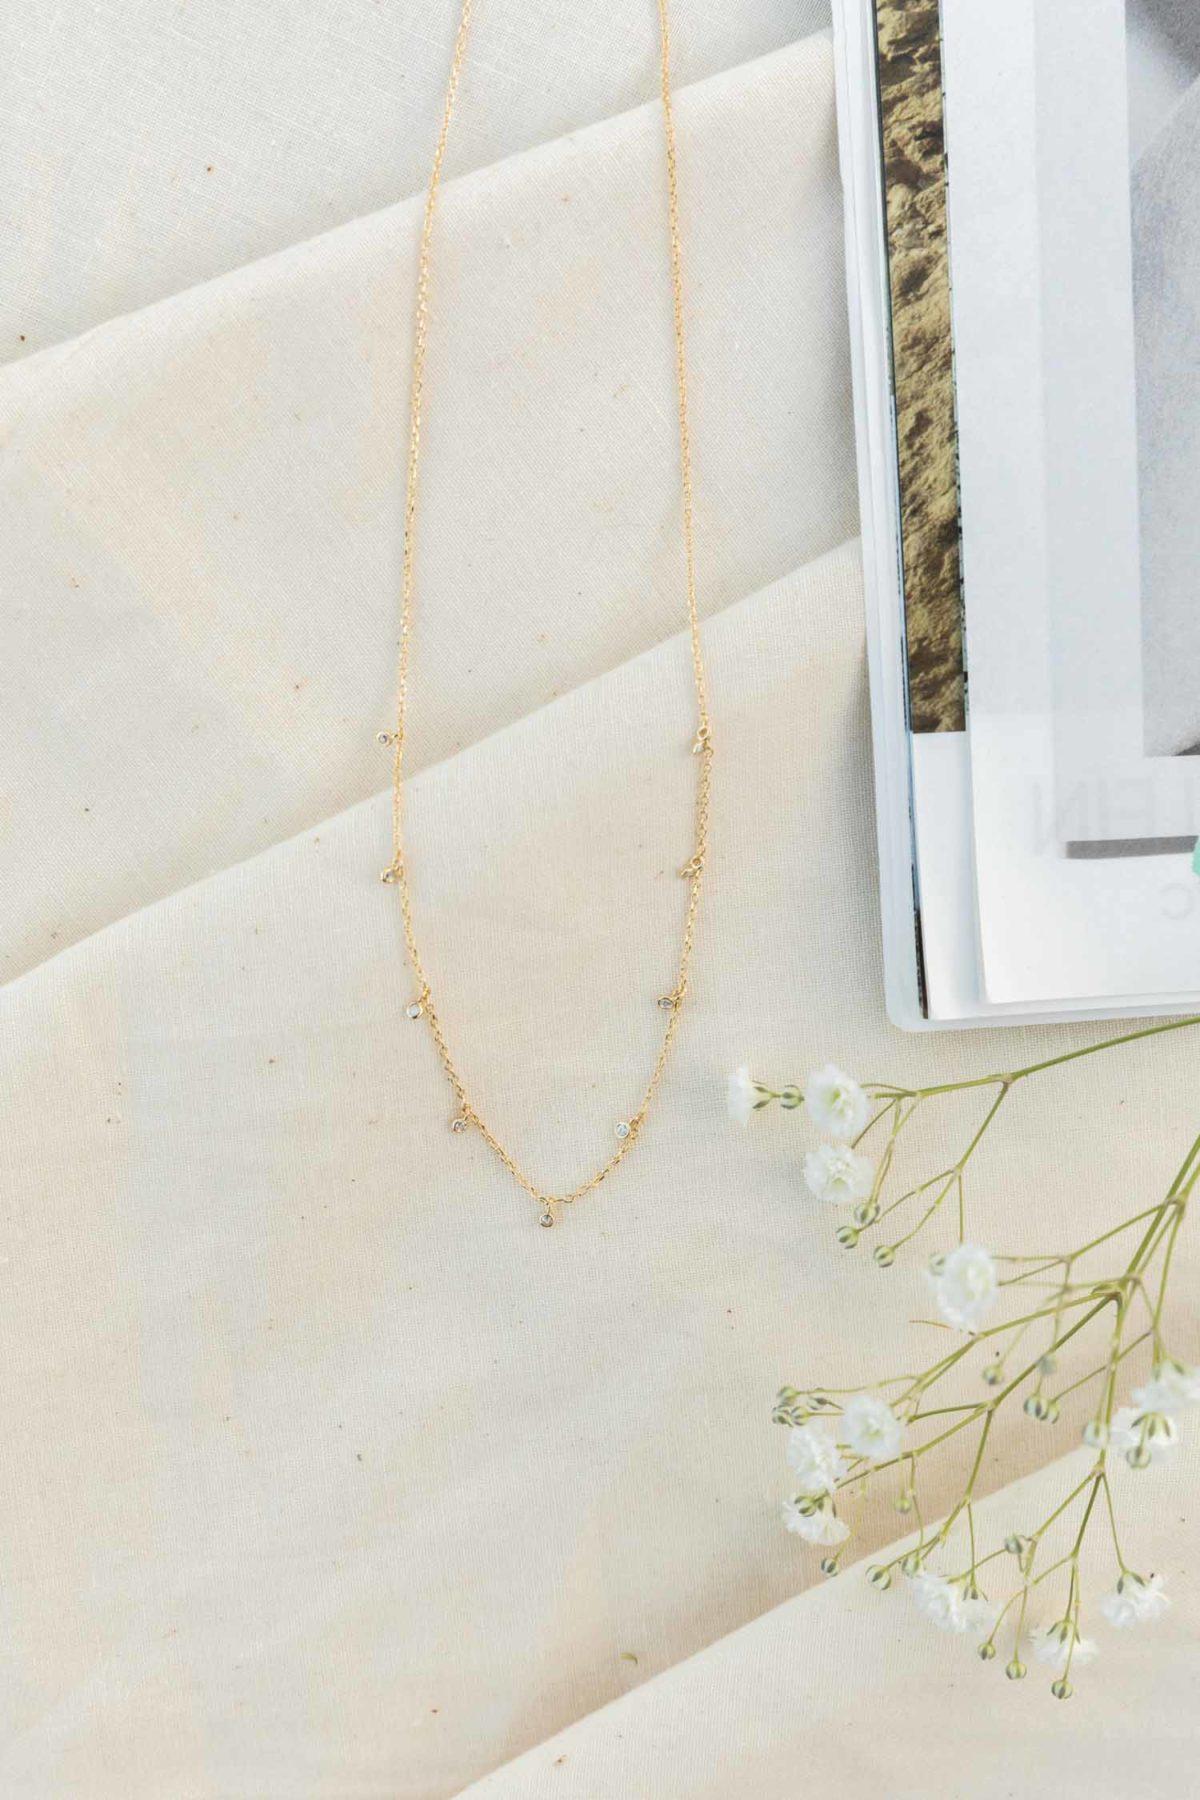 Jeweled Choker in Gold